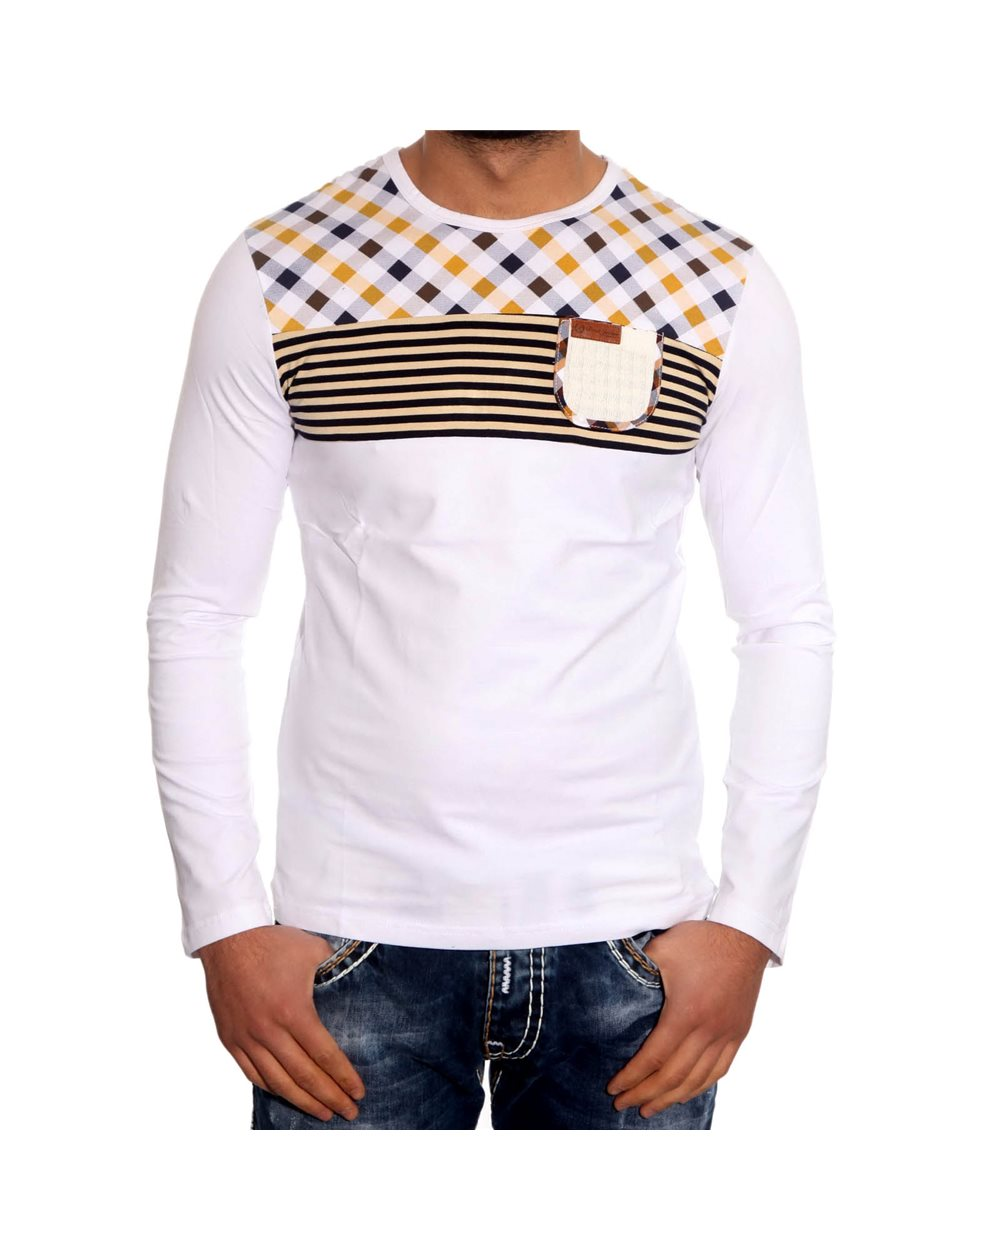 Subliminal Mode - Tee shirt homme manches longues col arrondi arrondi pull leger SB8110